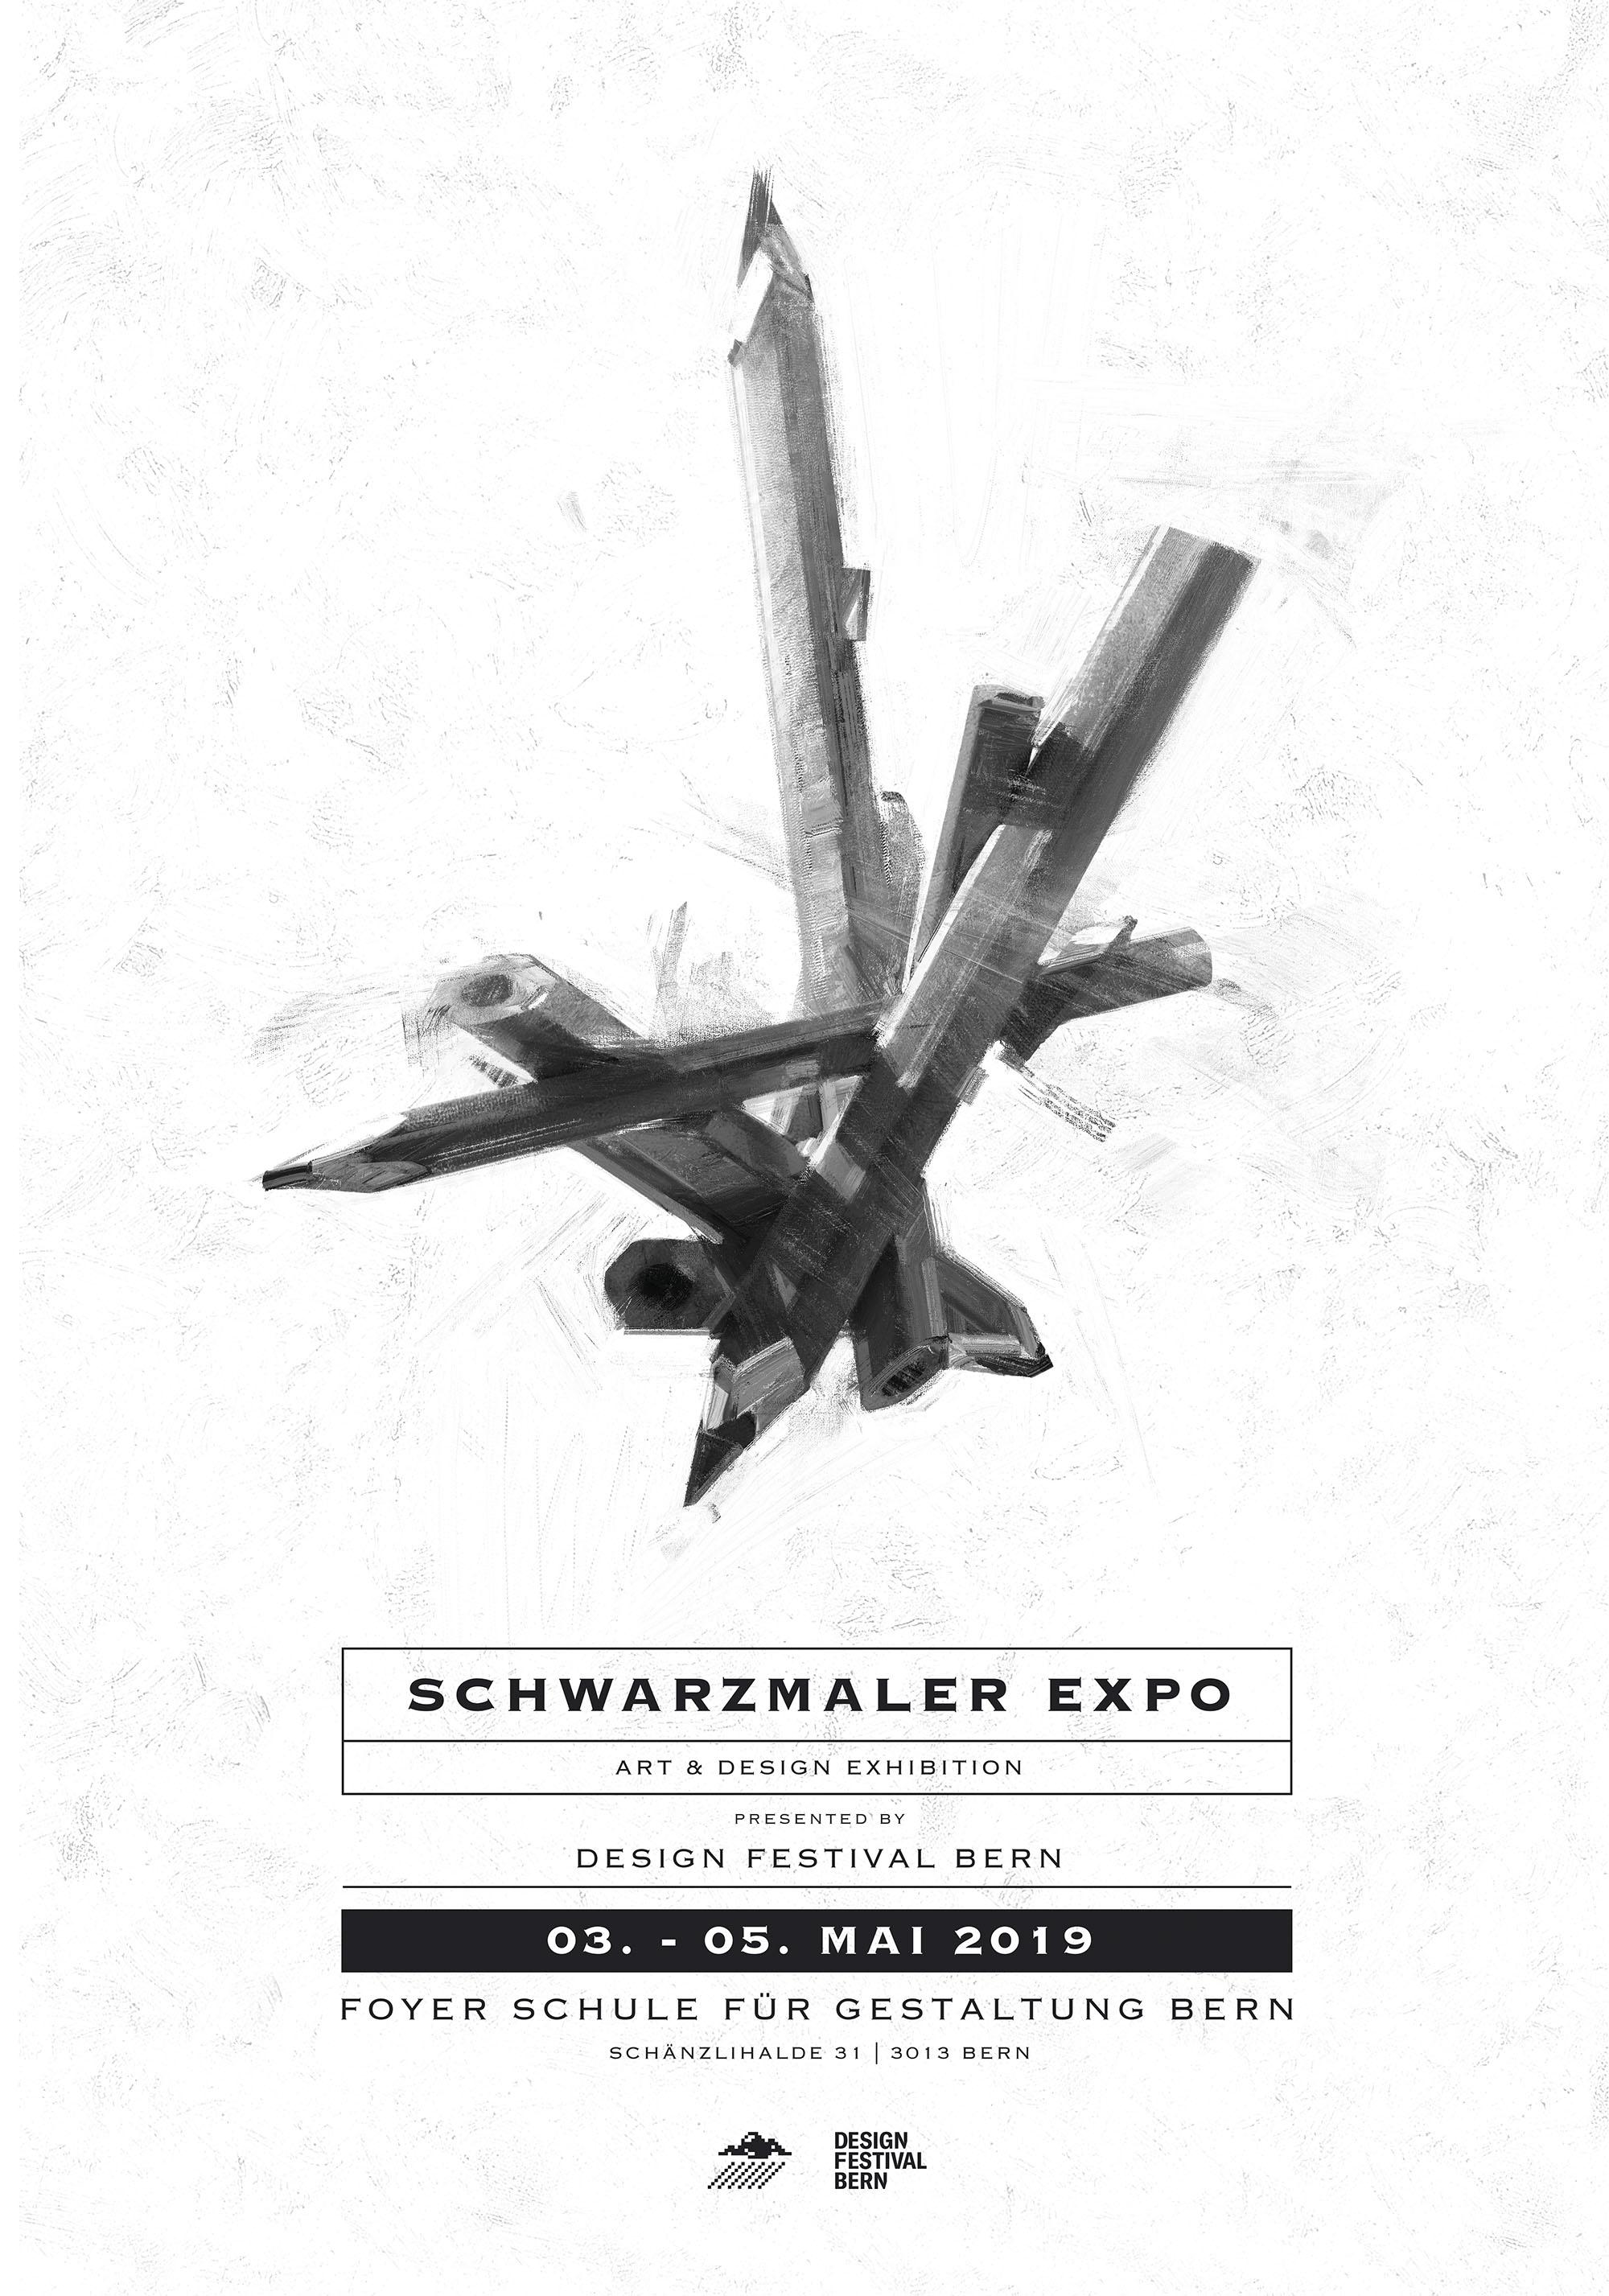 Schwarzmaler Expo